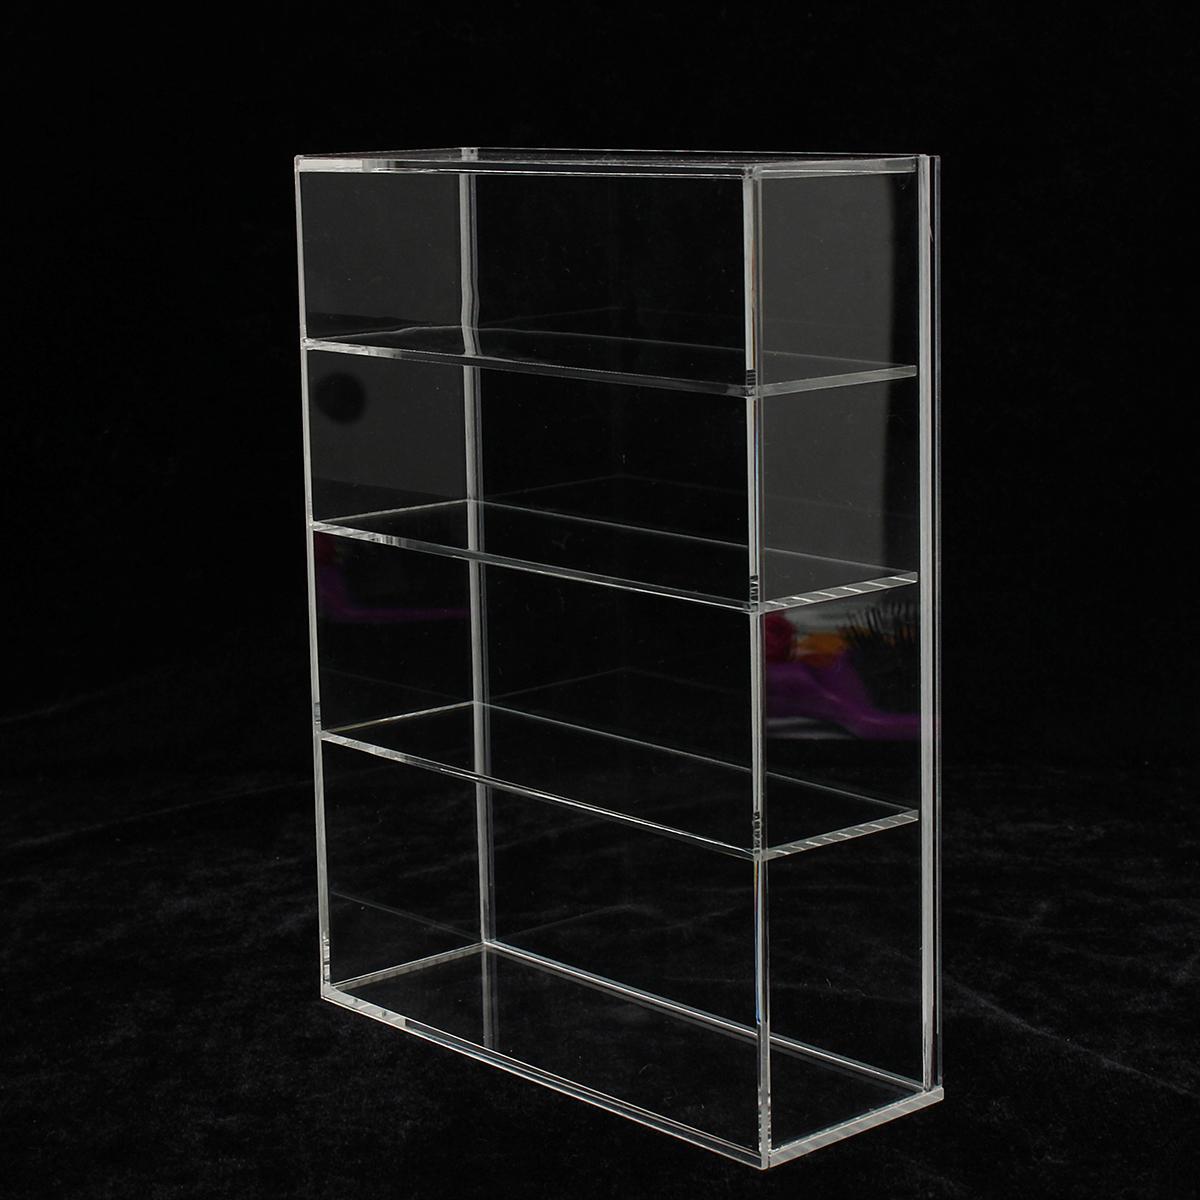 214 x 159 x 59mm Four-layer Acrylic Display Box Show Case Sliding Door For Mini Perfume Bottle